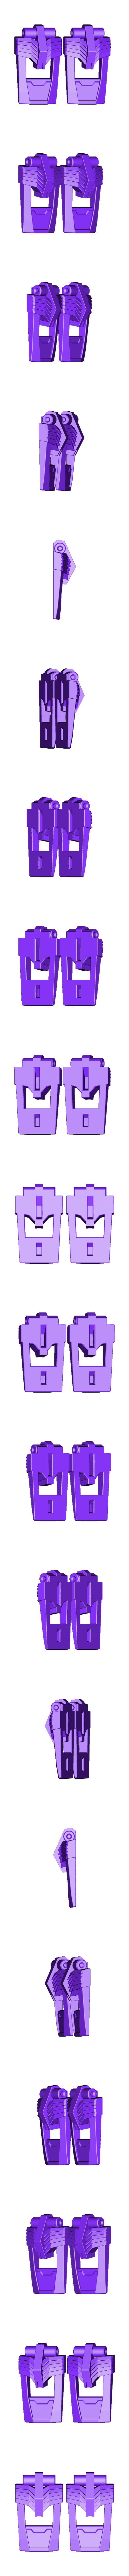 56_Drag_Leg6_ThighFront_GREY.stl Download STL file ARTICULATED DRAGONLORD (not Dragonzord) - NO SUPPORT • 3D printer model, Toymakr3D